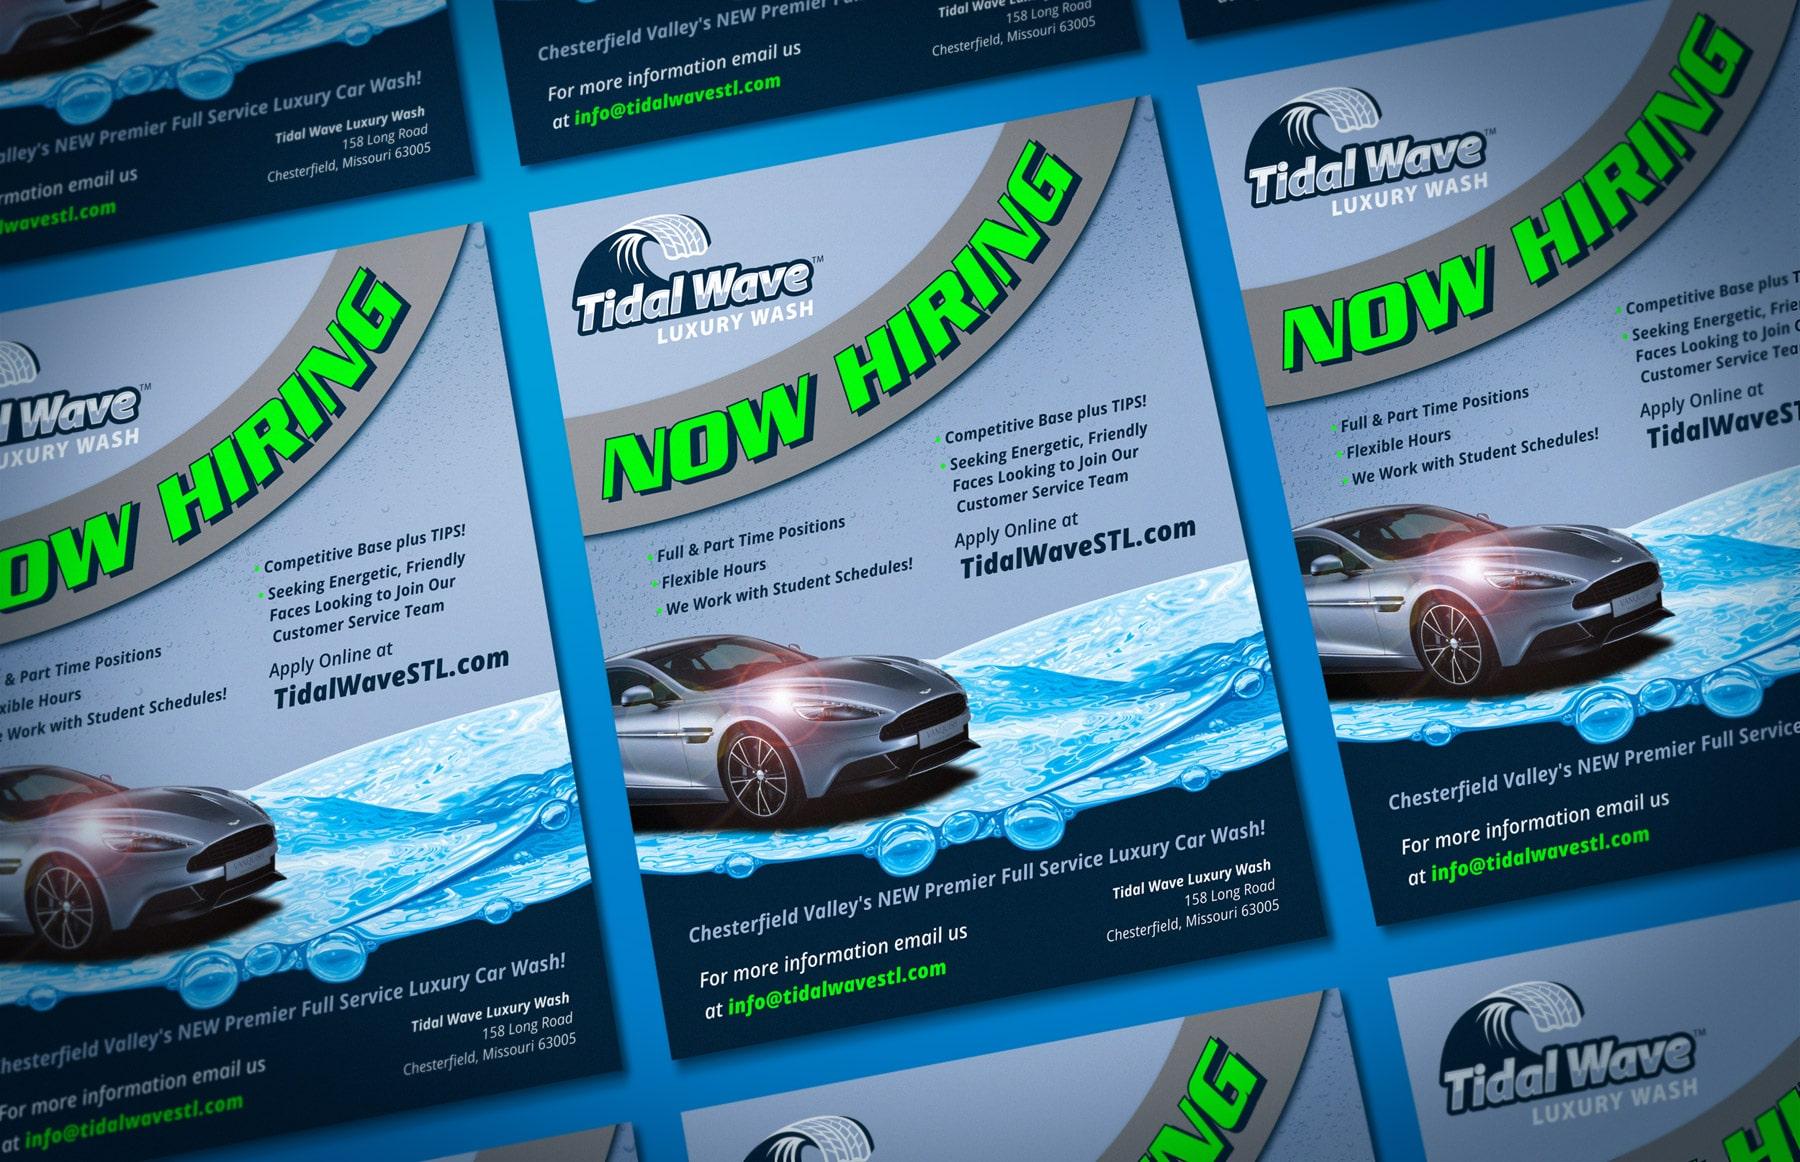 Tidal Wave Now Hiring Flyer Design branding